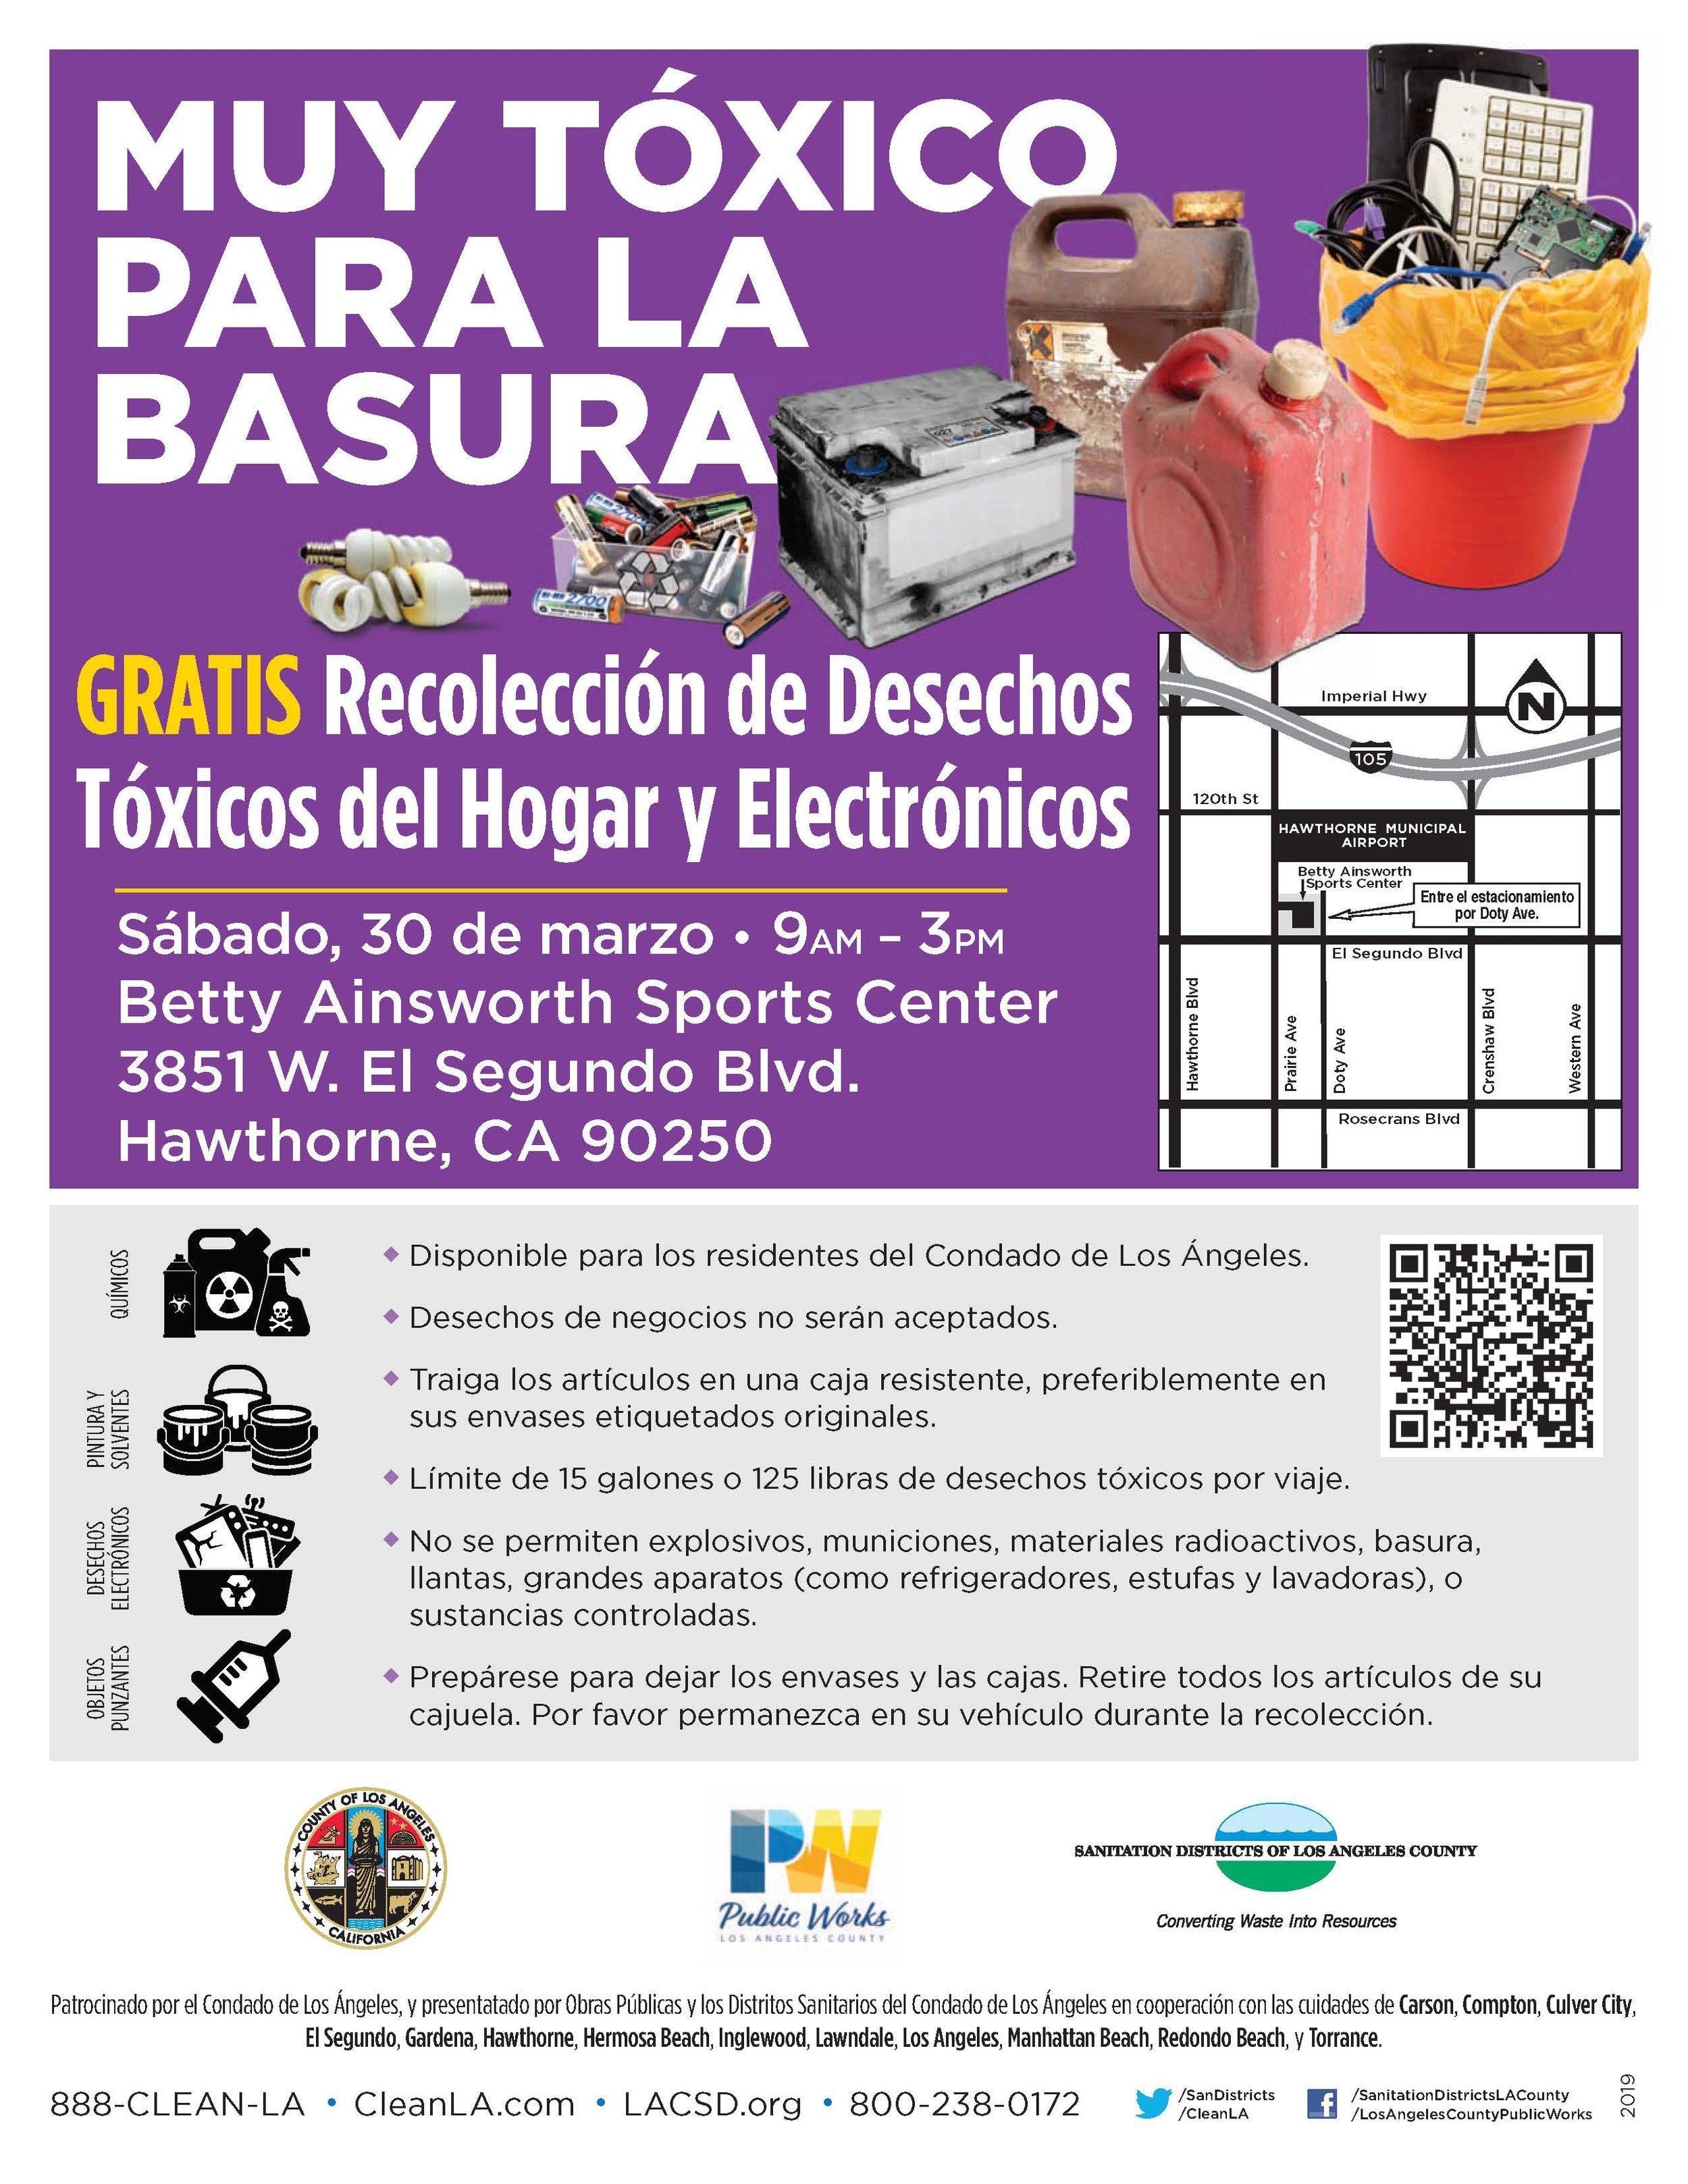 Household Hazardous & Electronic Waste Recycling Roundup - Spanish